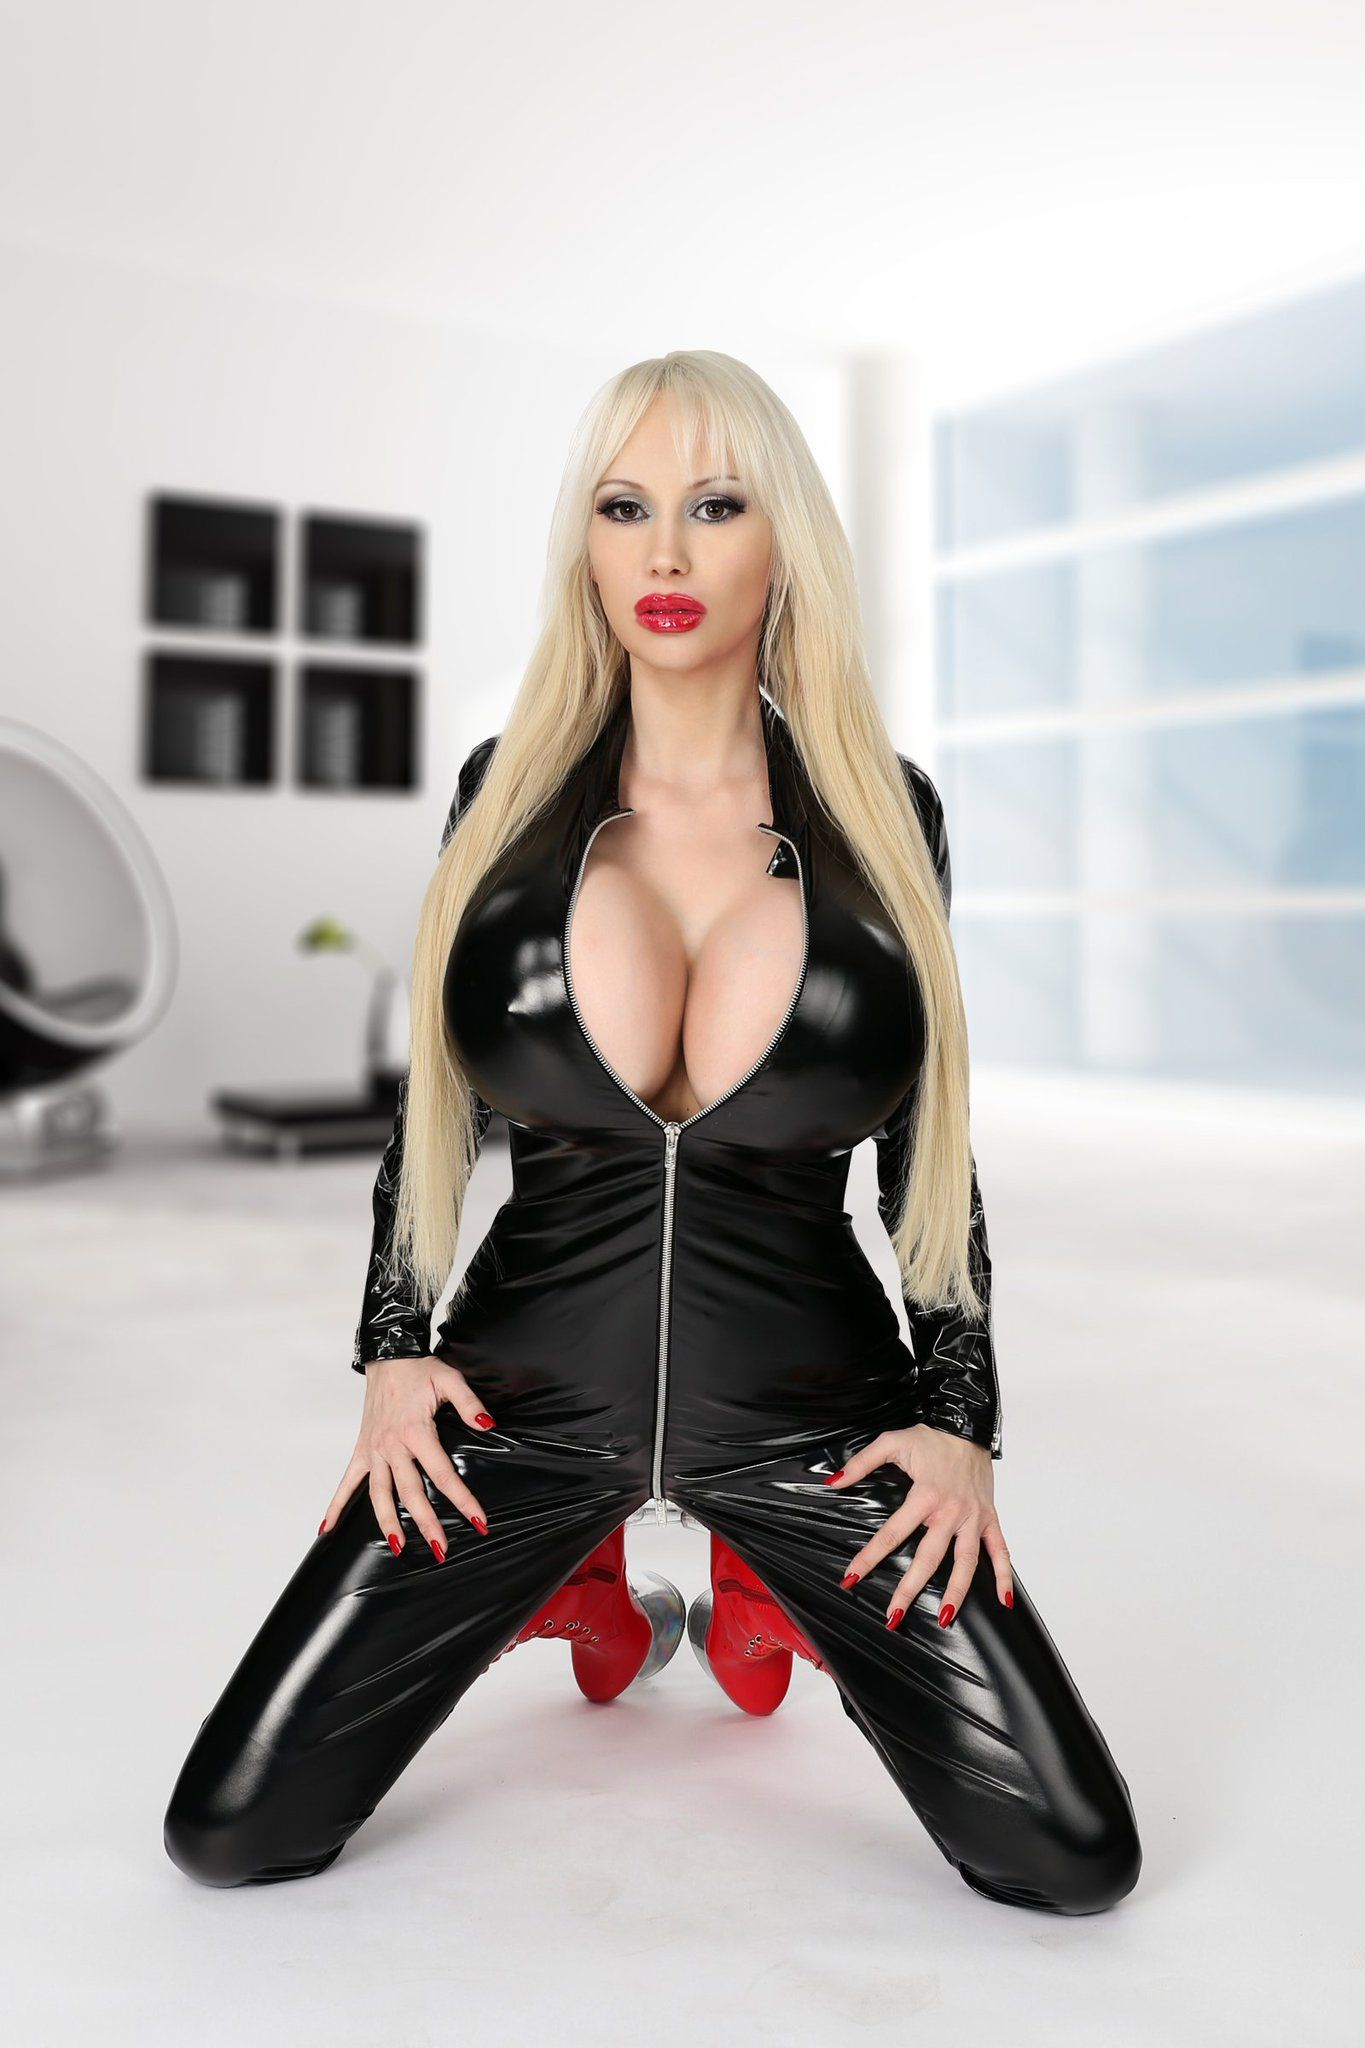 Candid tanned blonde in black bikini bottoms walking 4